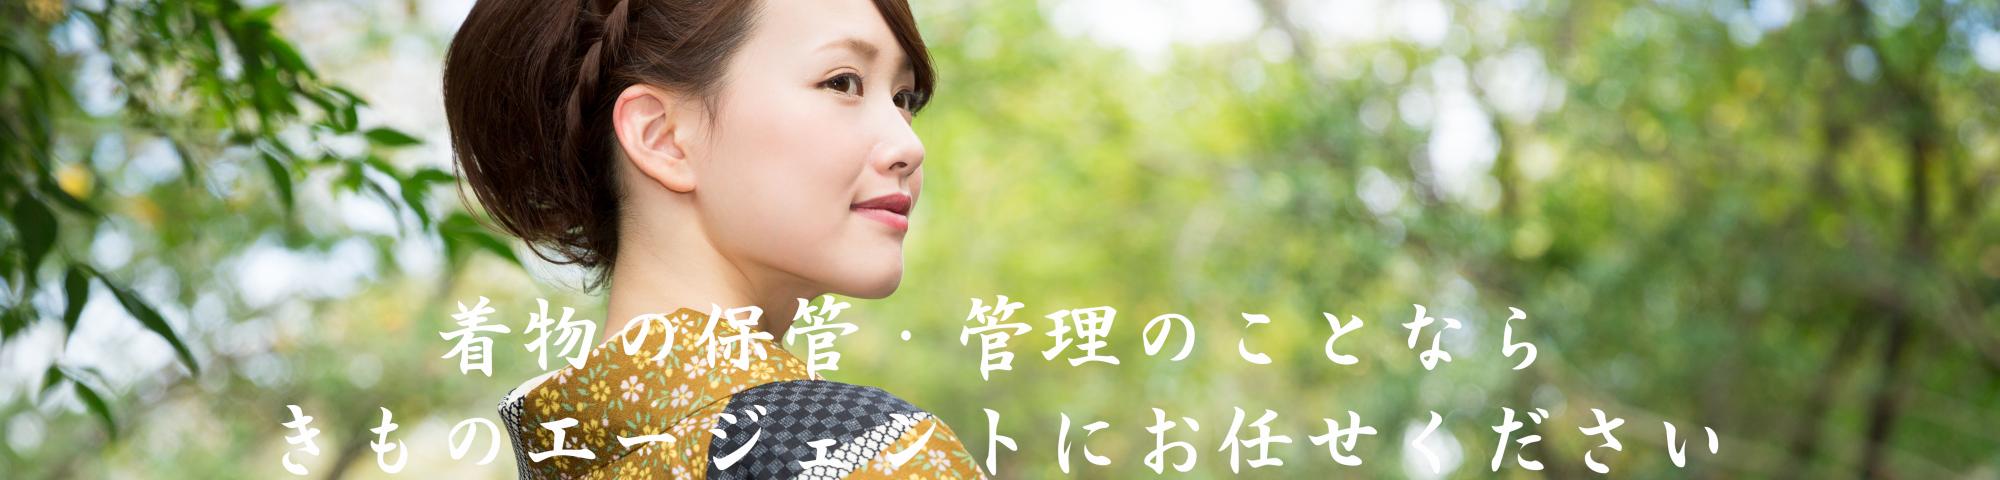 kimono-agent